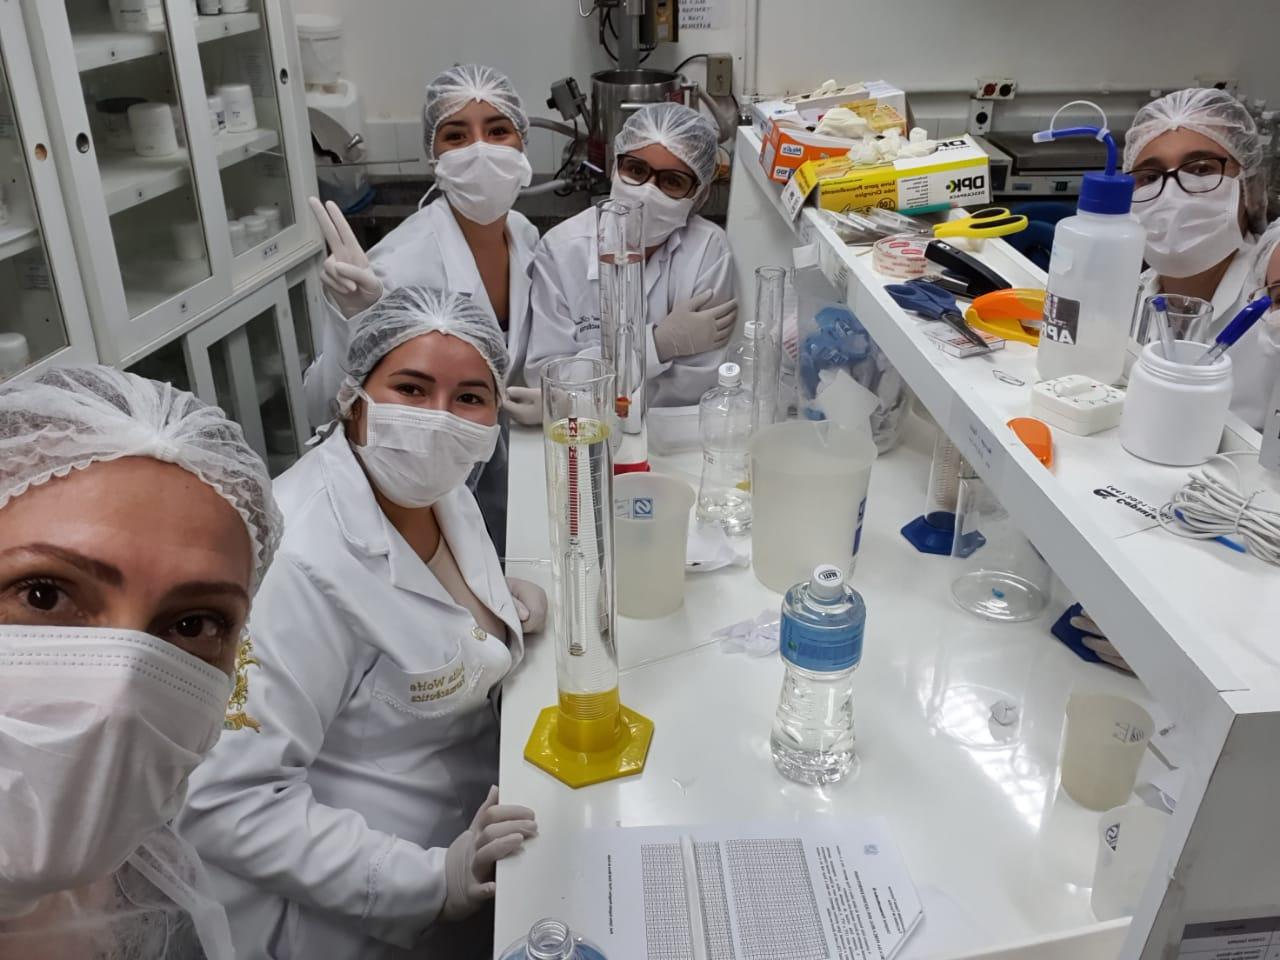 Laboratórios da Farmácia Universitária produzindo álcool 70% na luta contra COVID-19